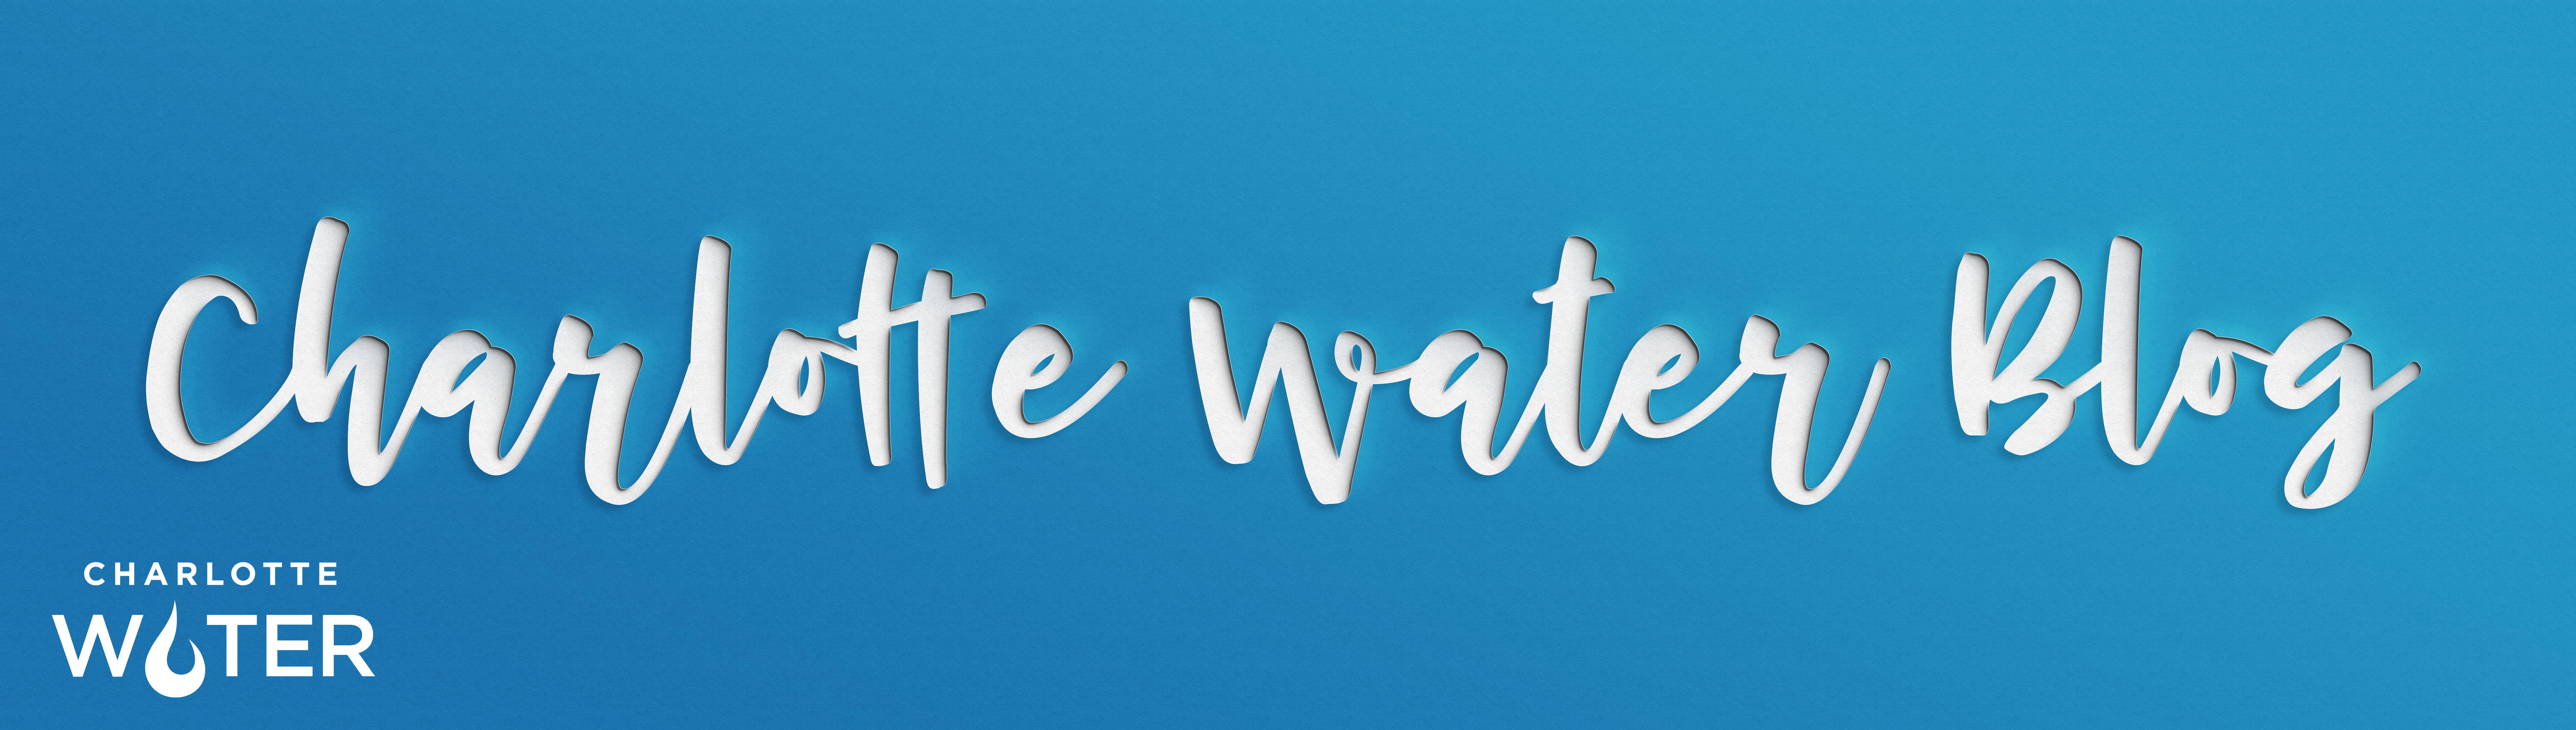 Charlotte Water Blog